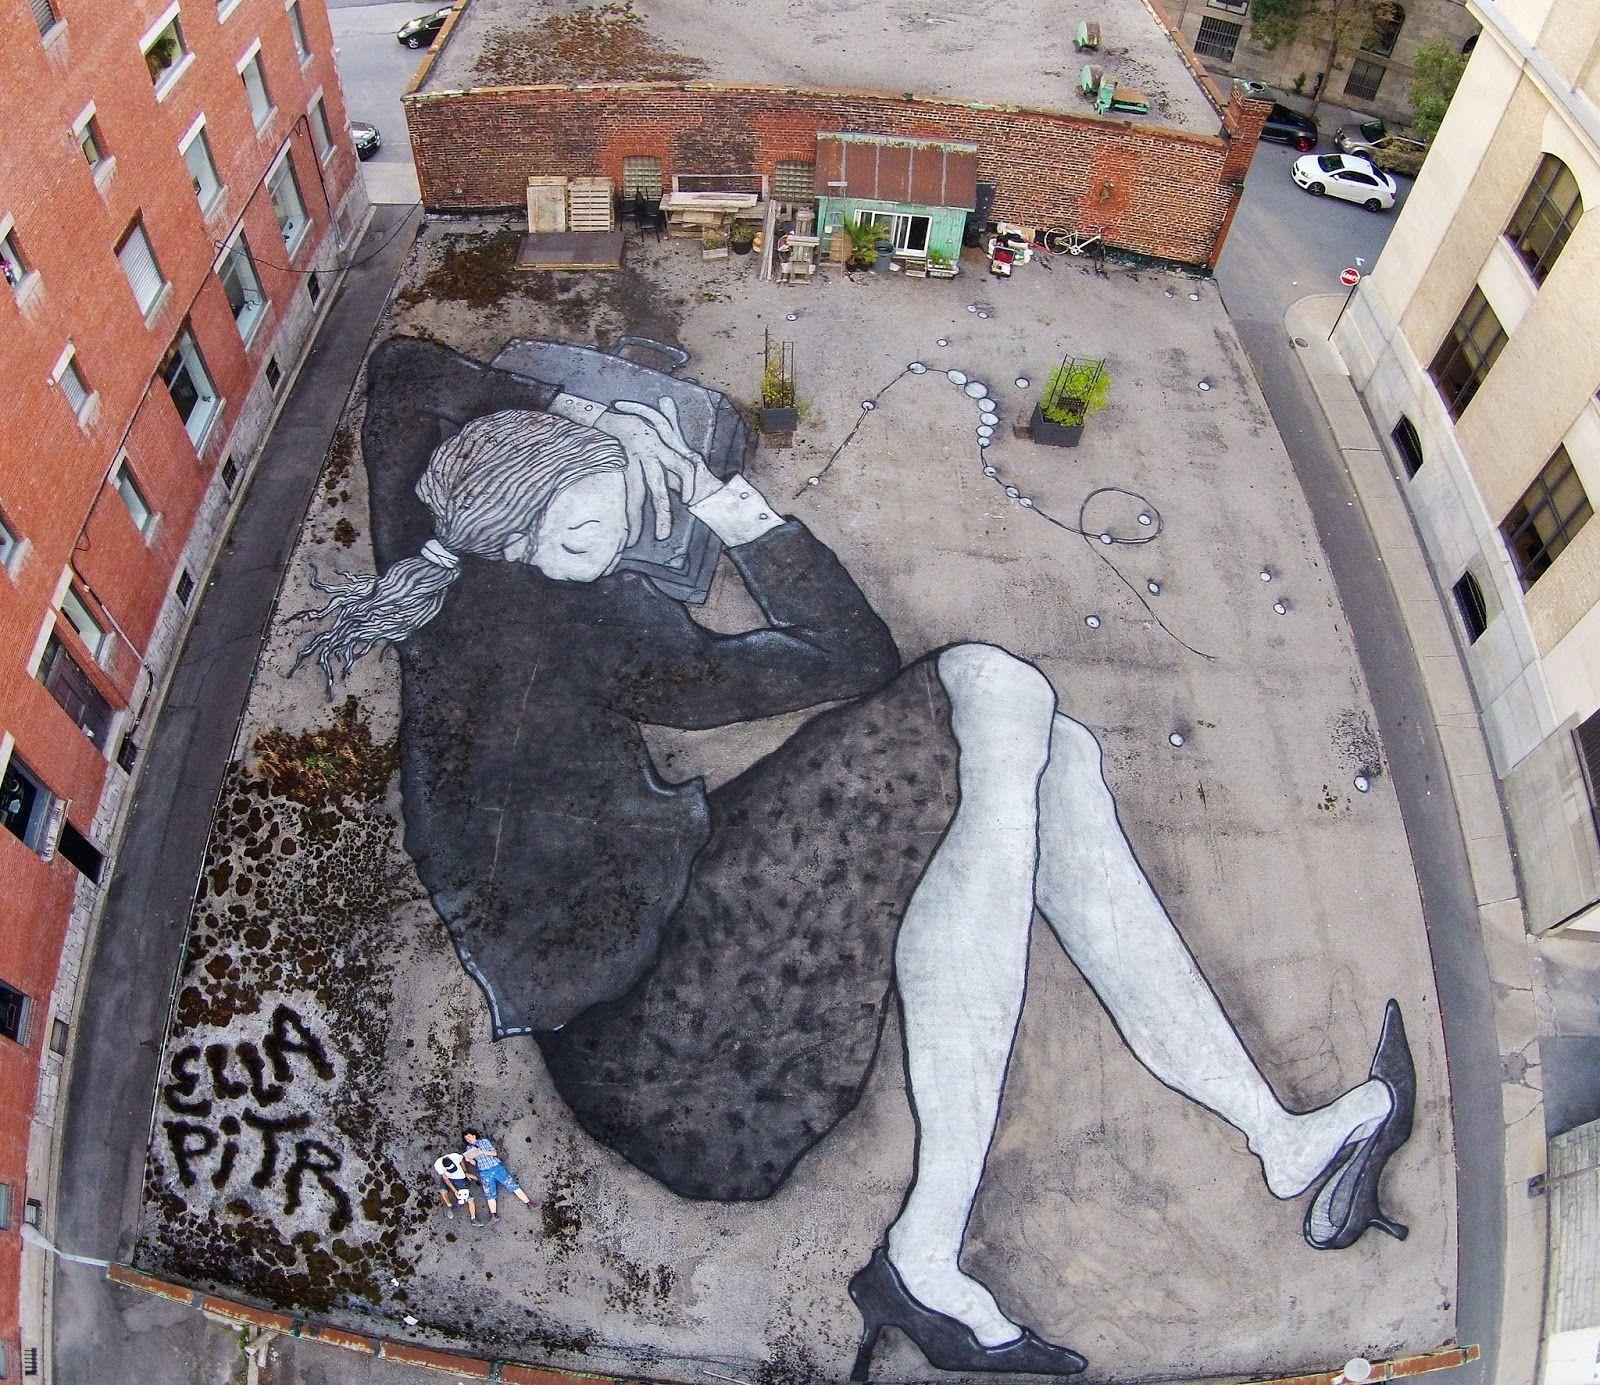 10 Most Popular Street Art Pieces Of August 2014 9. Ella & Pitr - Montreal, Canada / The 10 Most Popular Street Art Pieces Of August 20149. Ella & Pitr - Montreal, Canada / The 10 Most Popular Street Art Pieces Of August 2014